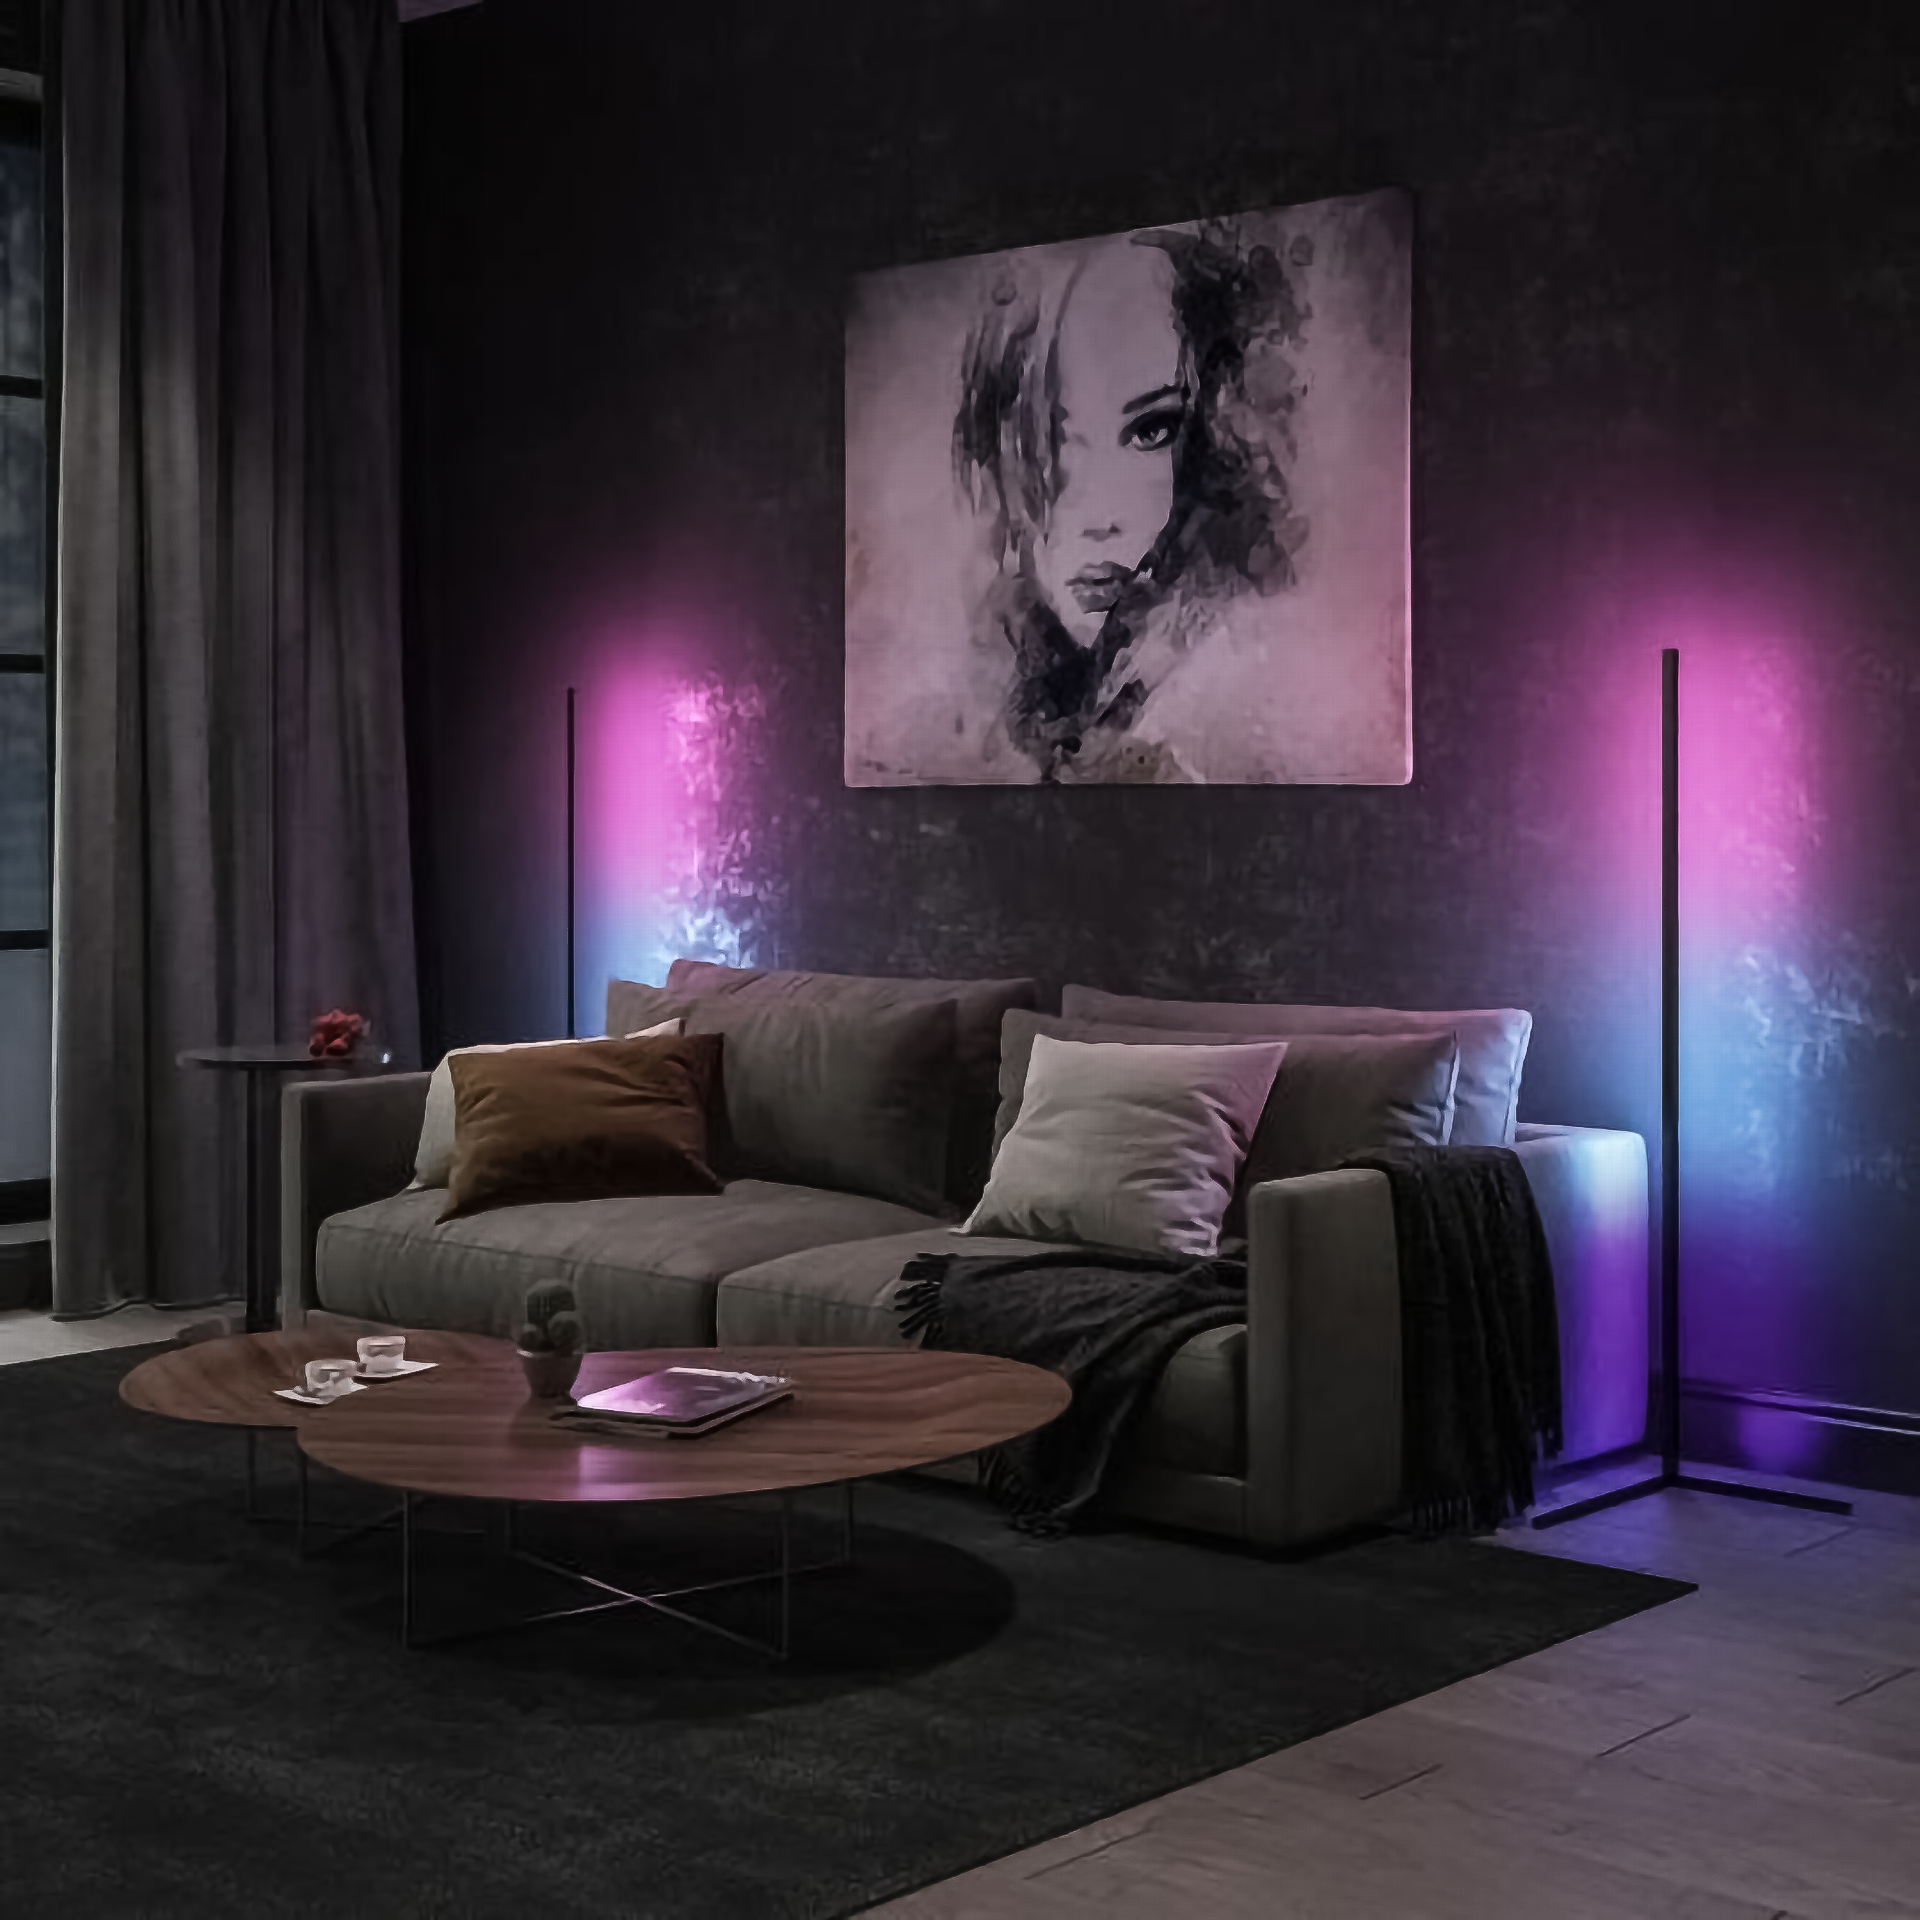 Apōllō Floor Lamp In 2020 Cool Room Designs Bedroom S